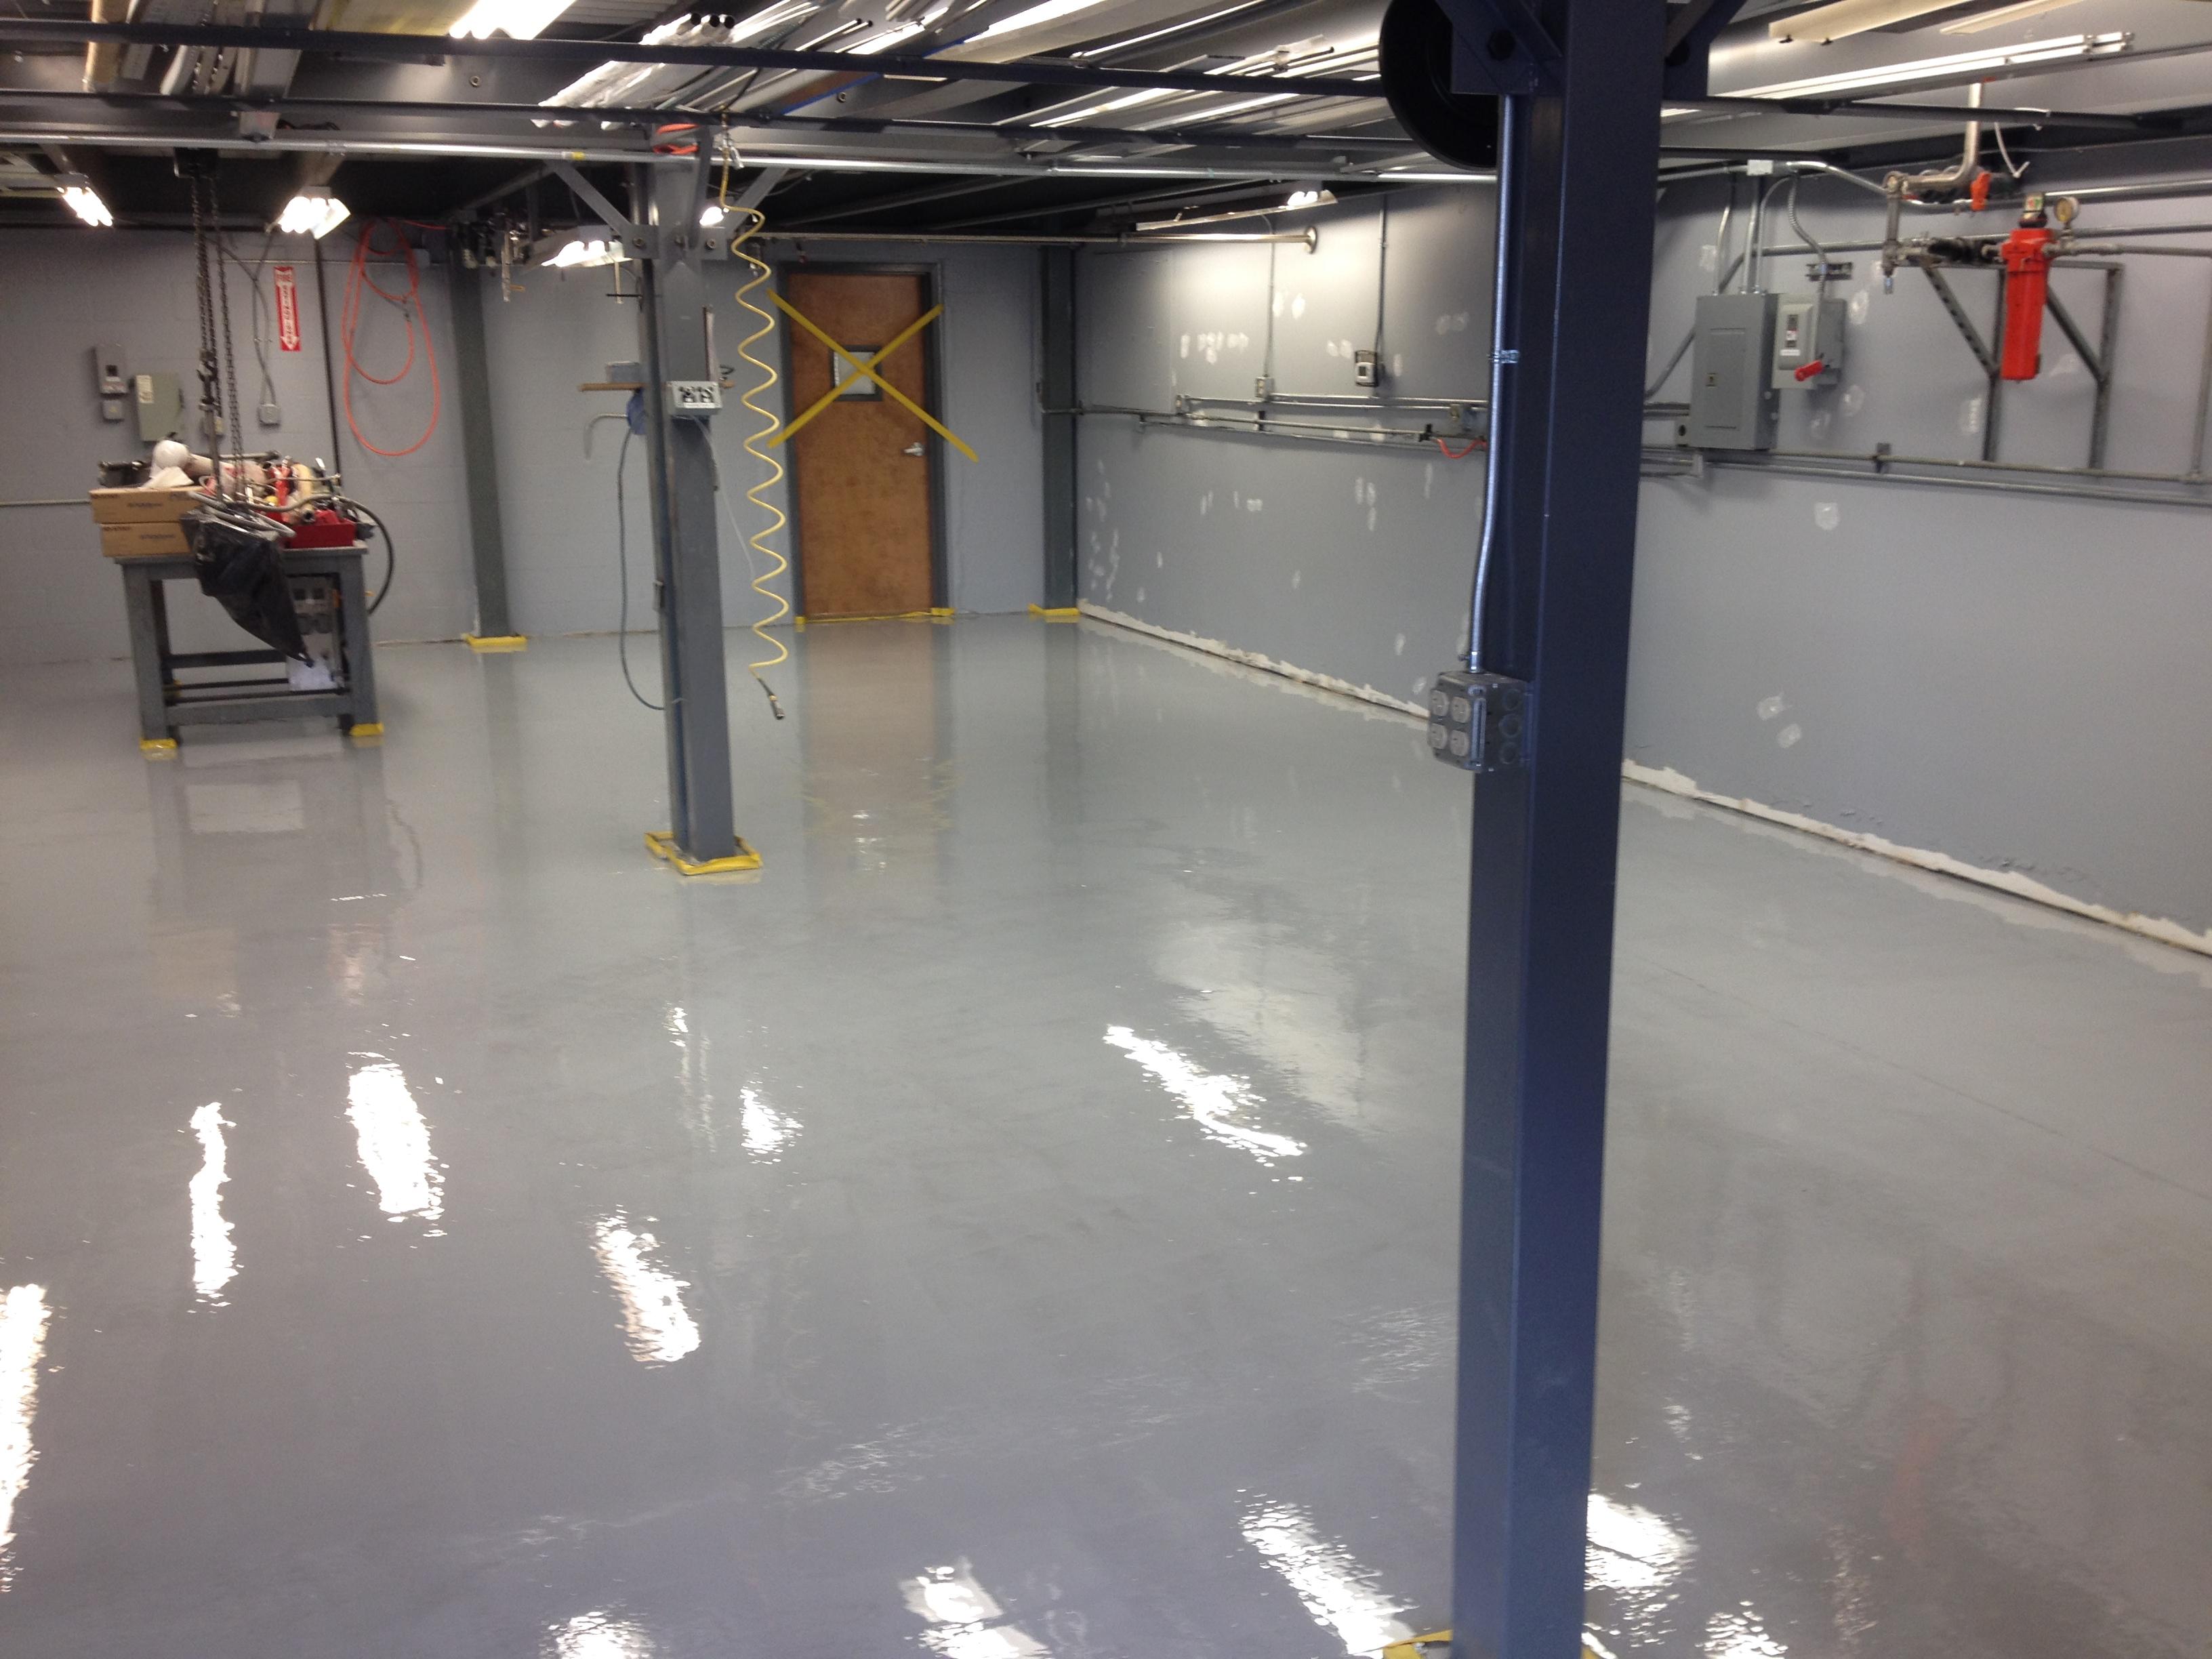 Floor Coatings - Mechanical Room Floor